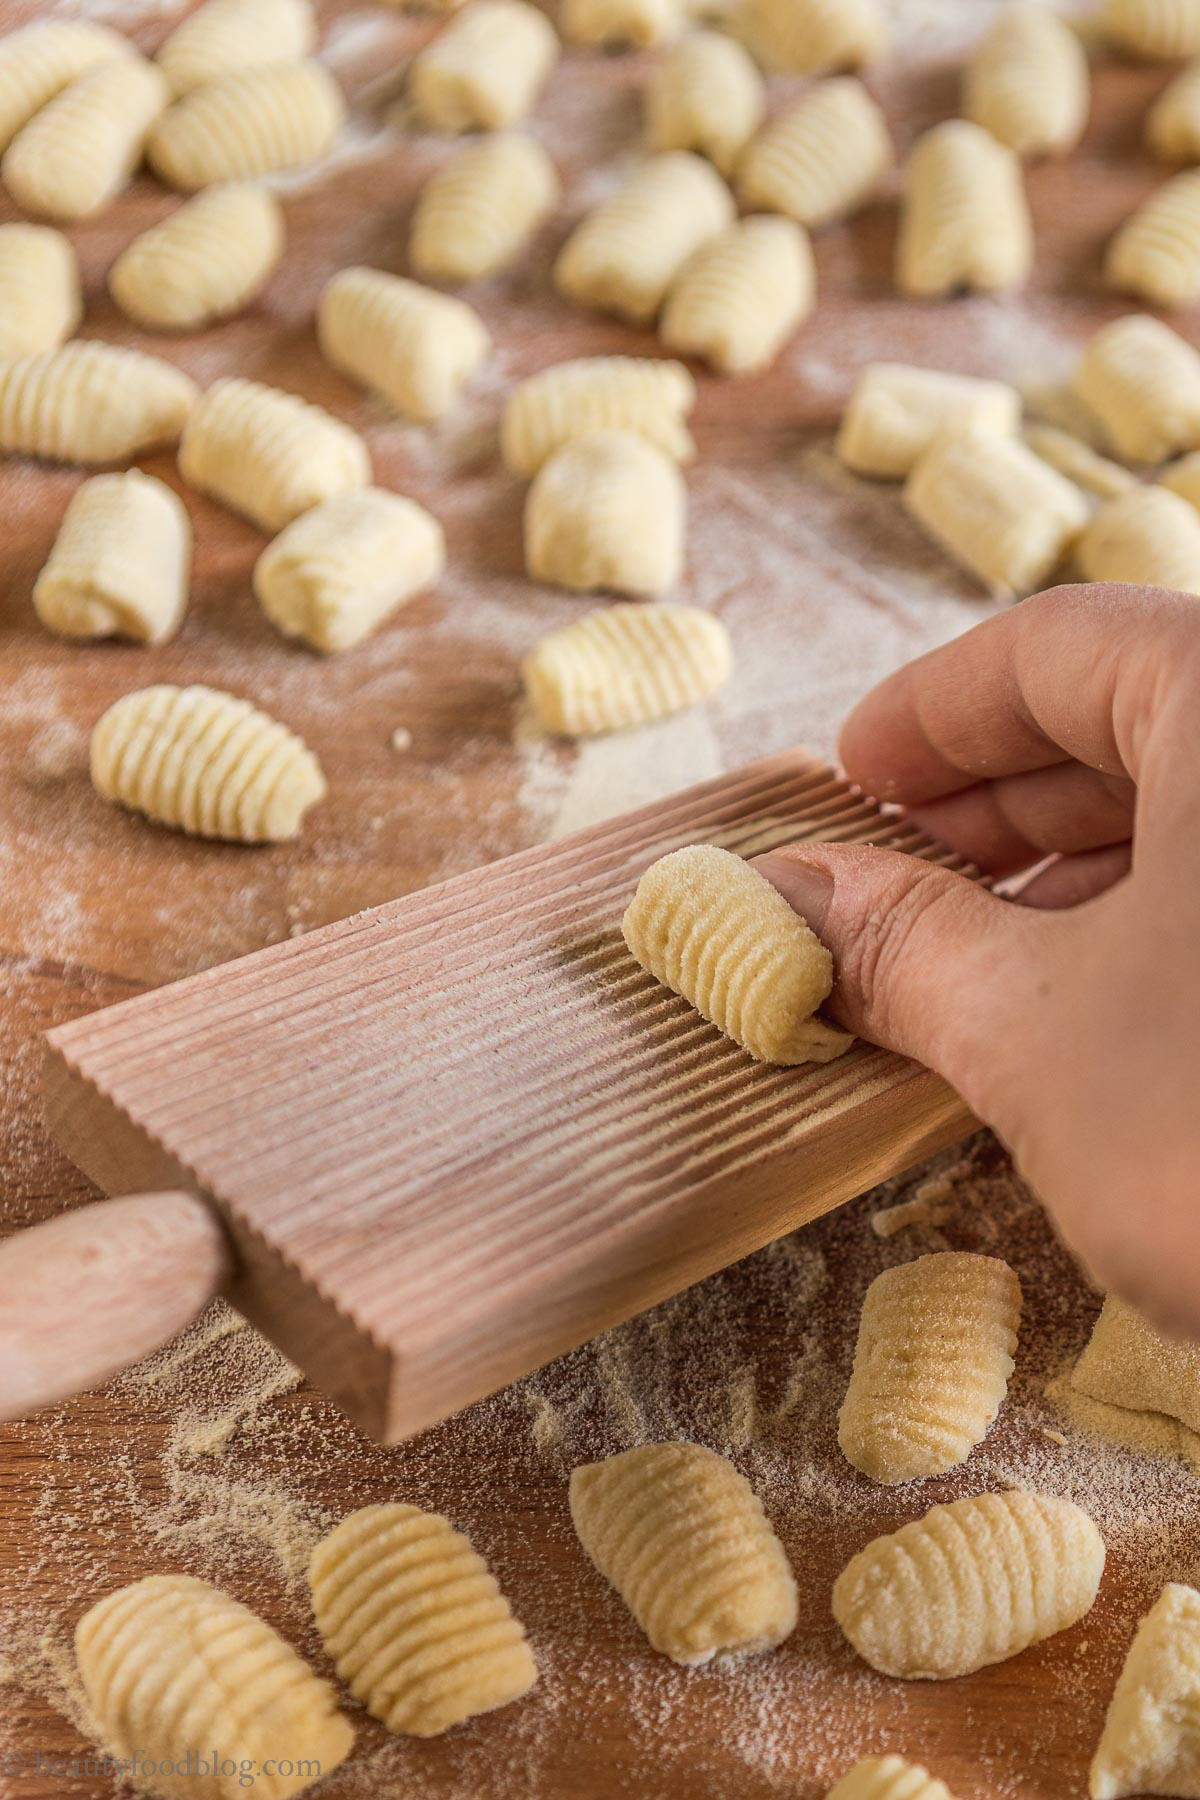 making gnocchi preparazione gnocchi rigati a mano